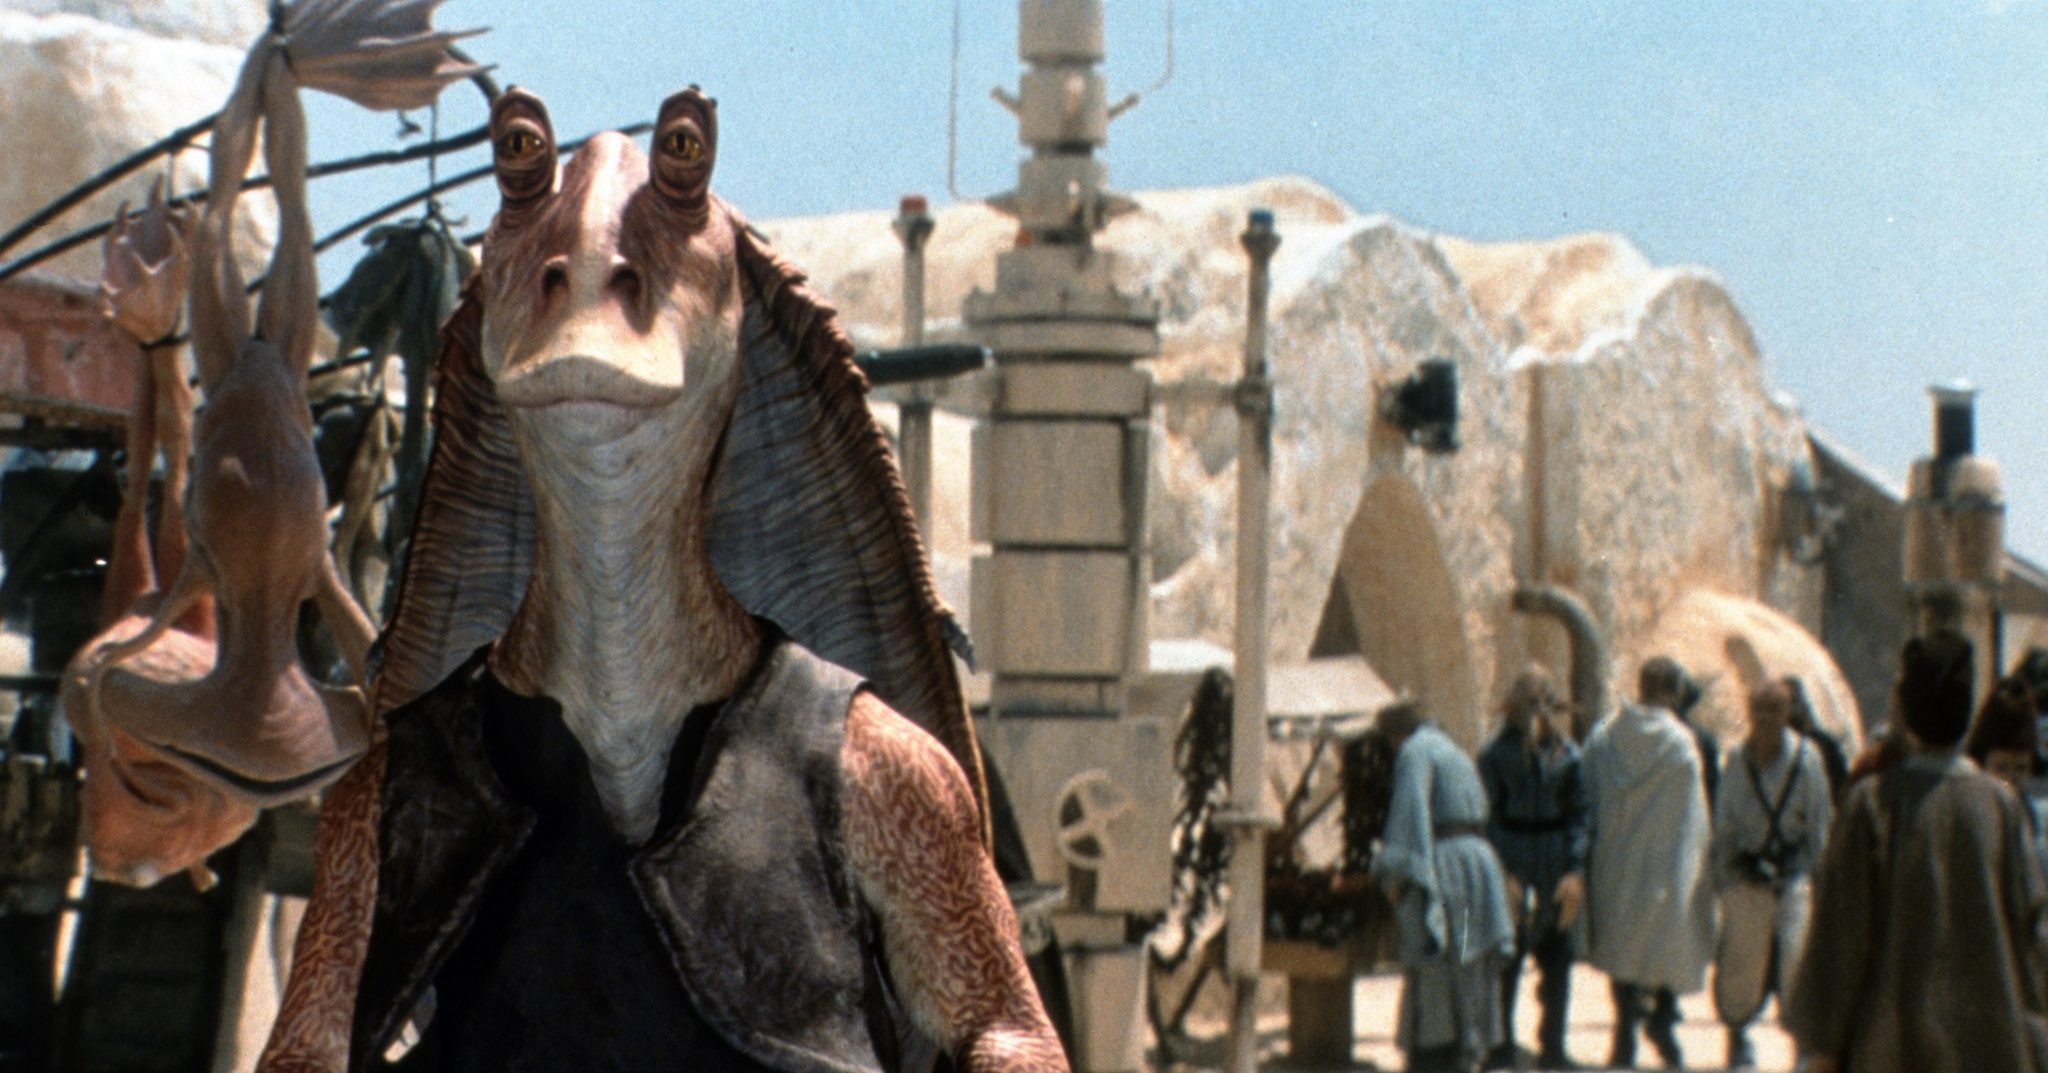 Jar Jar Binks actor responds to those criticisms- 'It was painful'